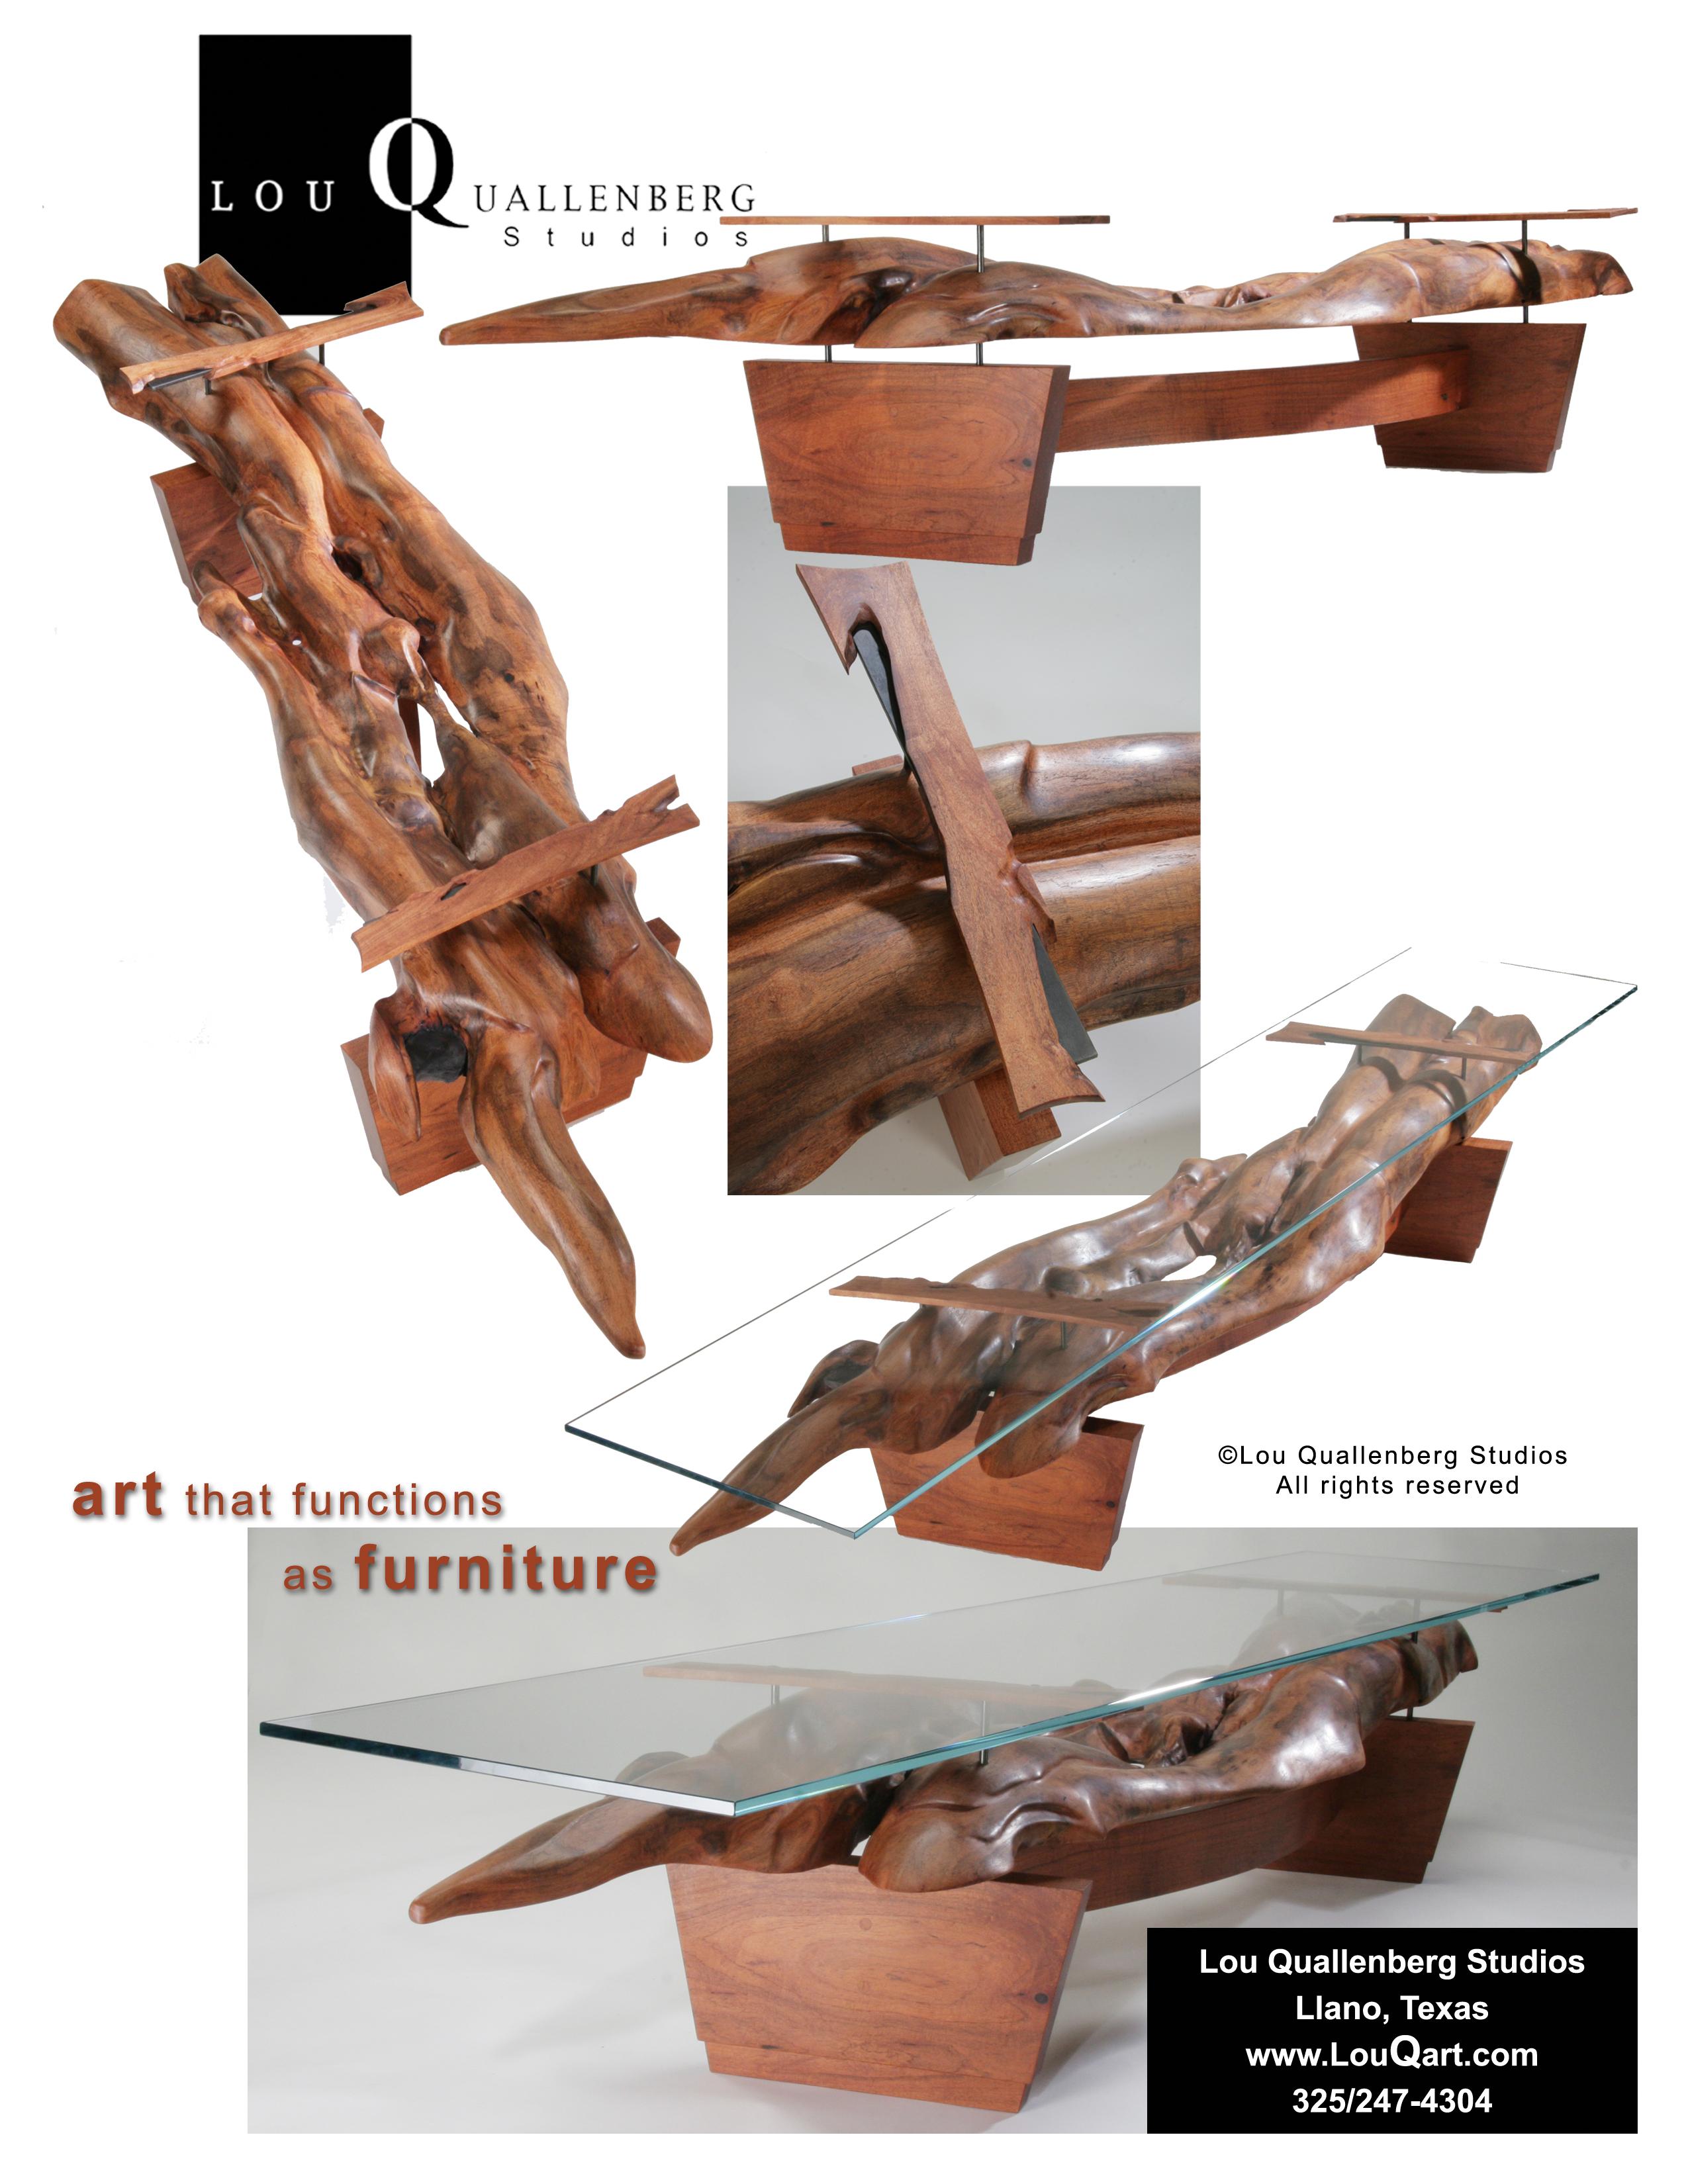 Mesquite Furniture by Lou Quallenberg Studios